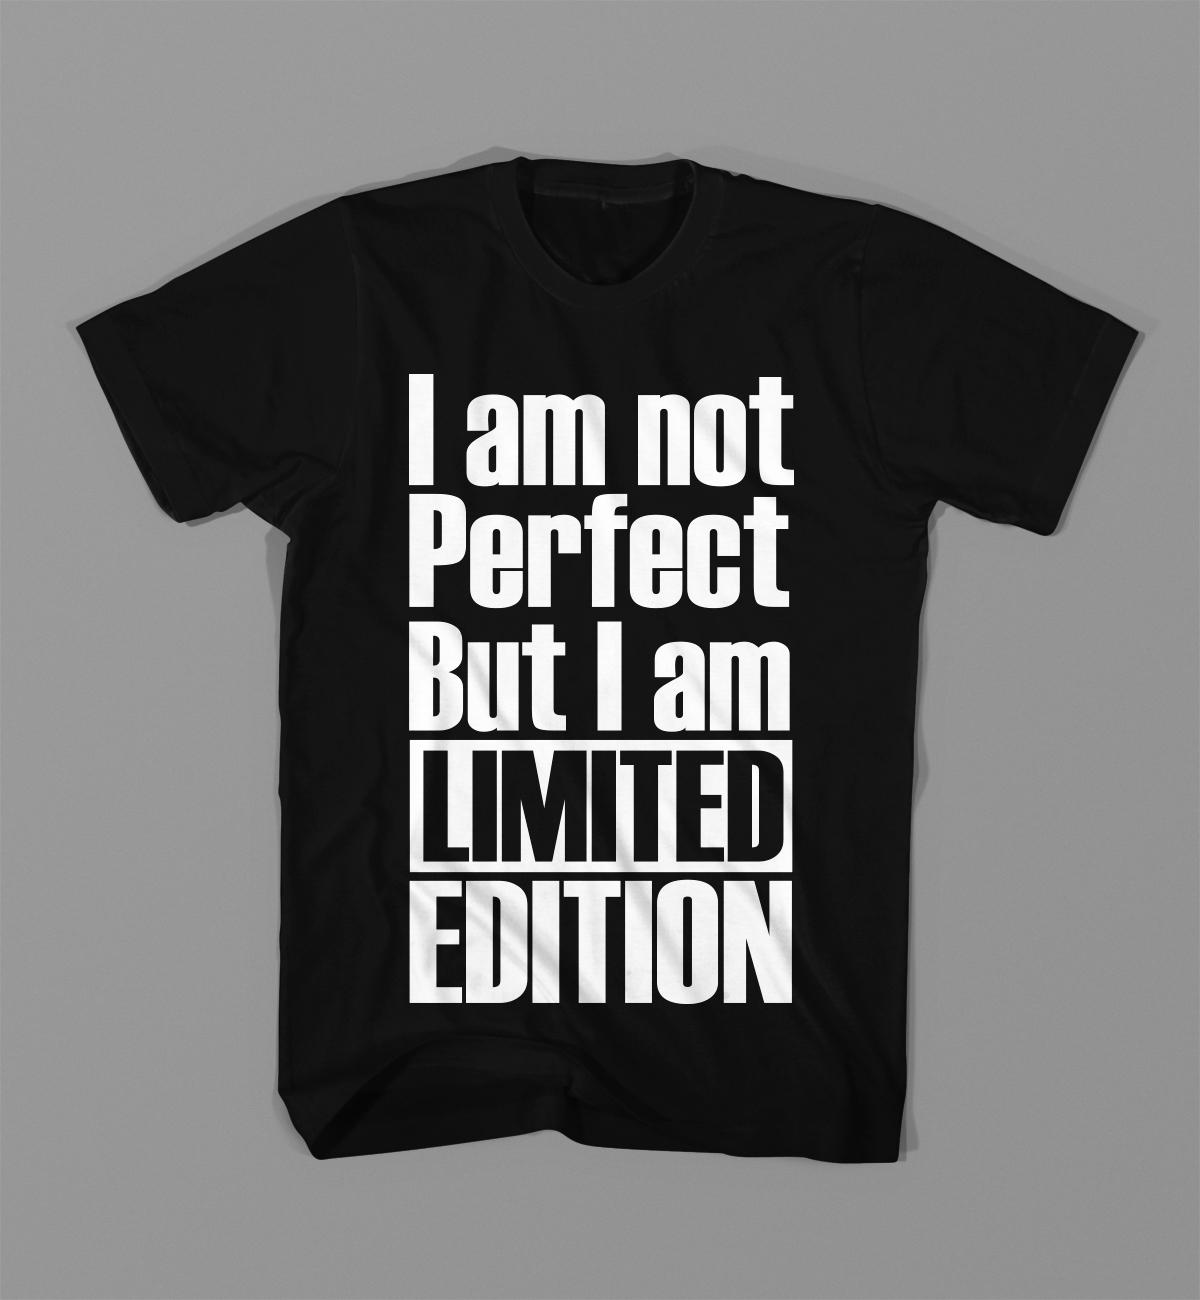 I Am Not Perfect But I Am Limited Edition - Image Copyright Images.BonanzaStatic.Com